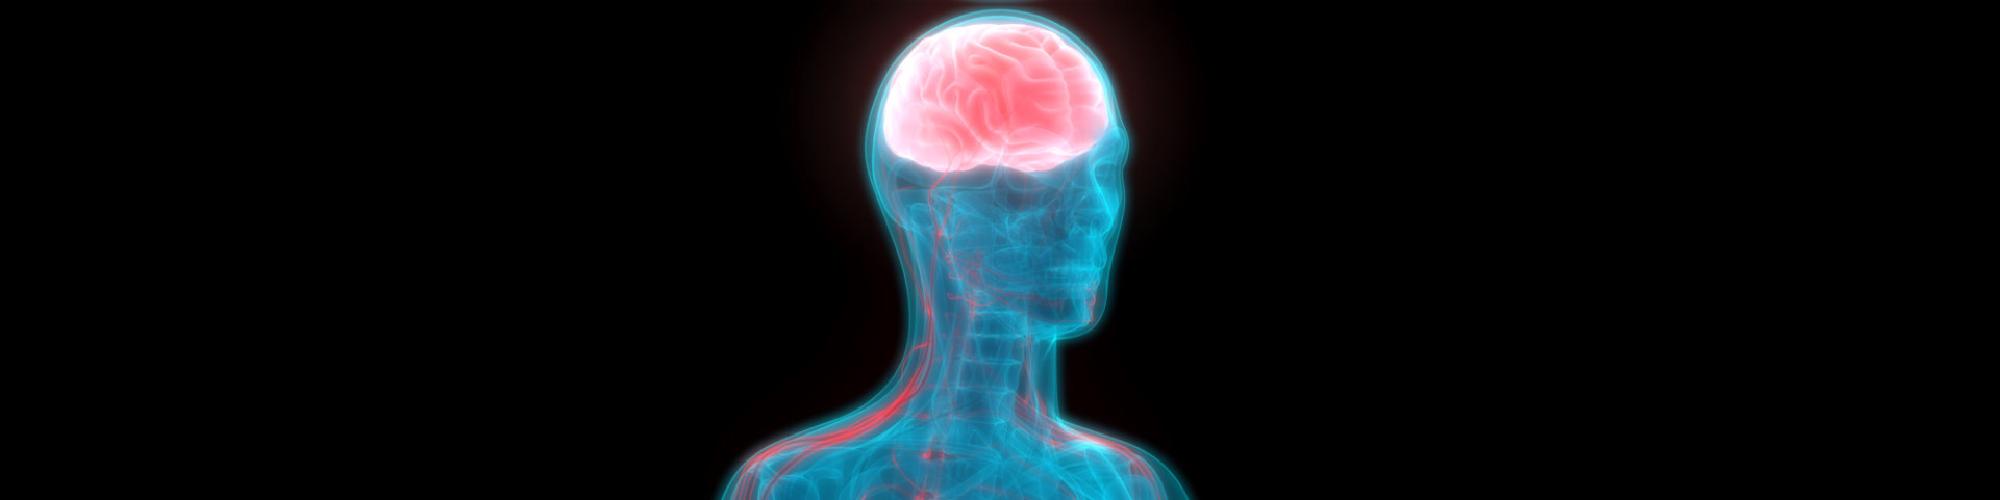 Human Brain with Nervous system Anatomy